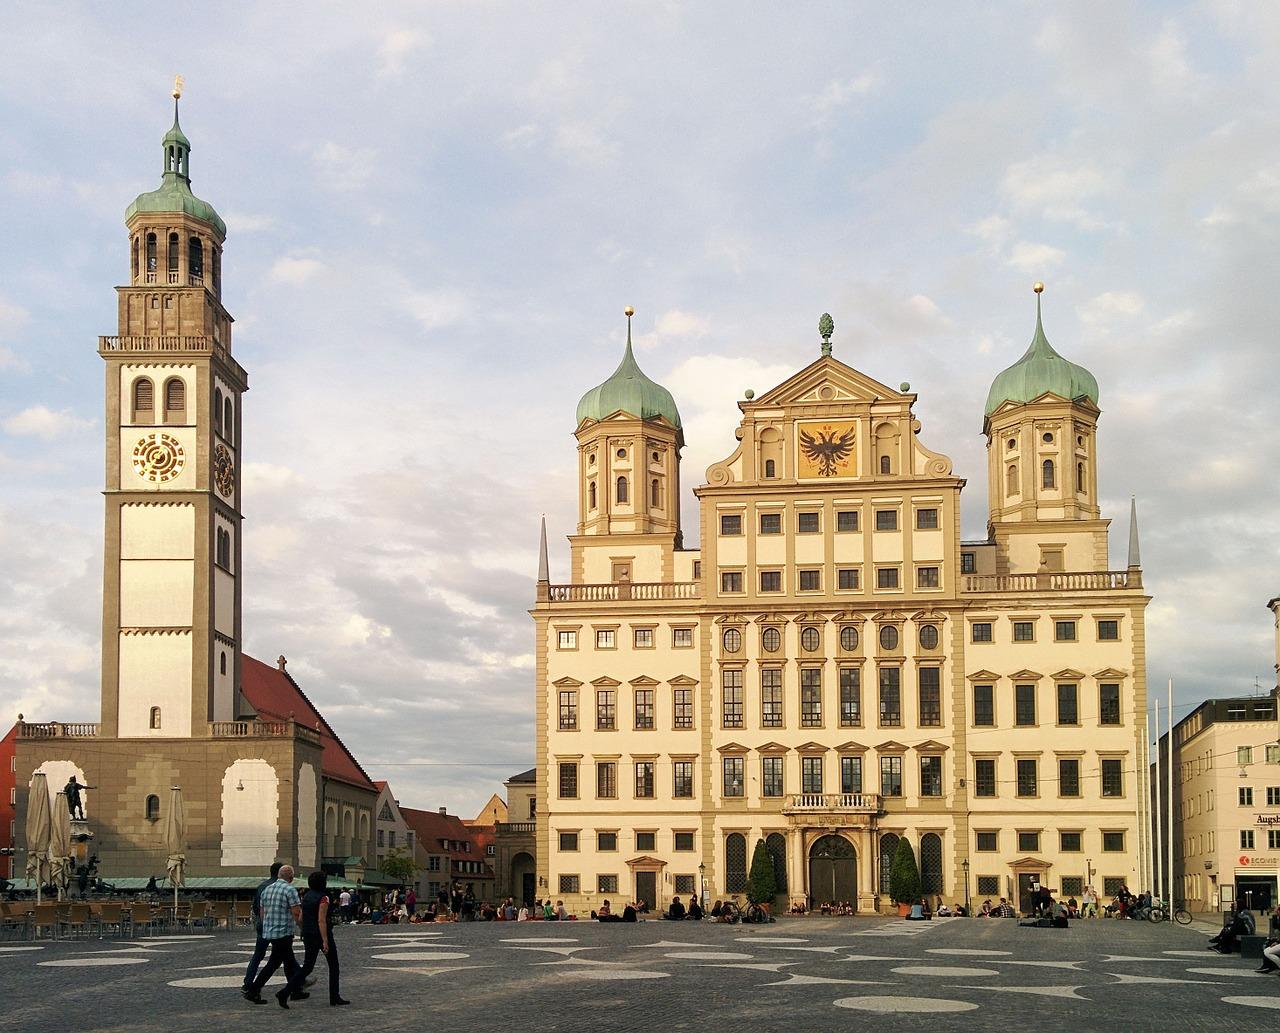 церква в Аугсбурзі (Augsburg)